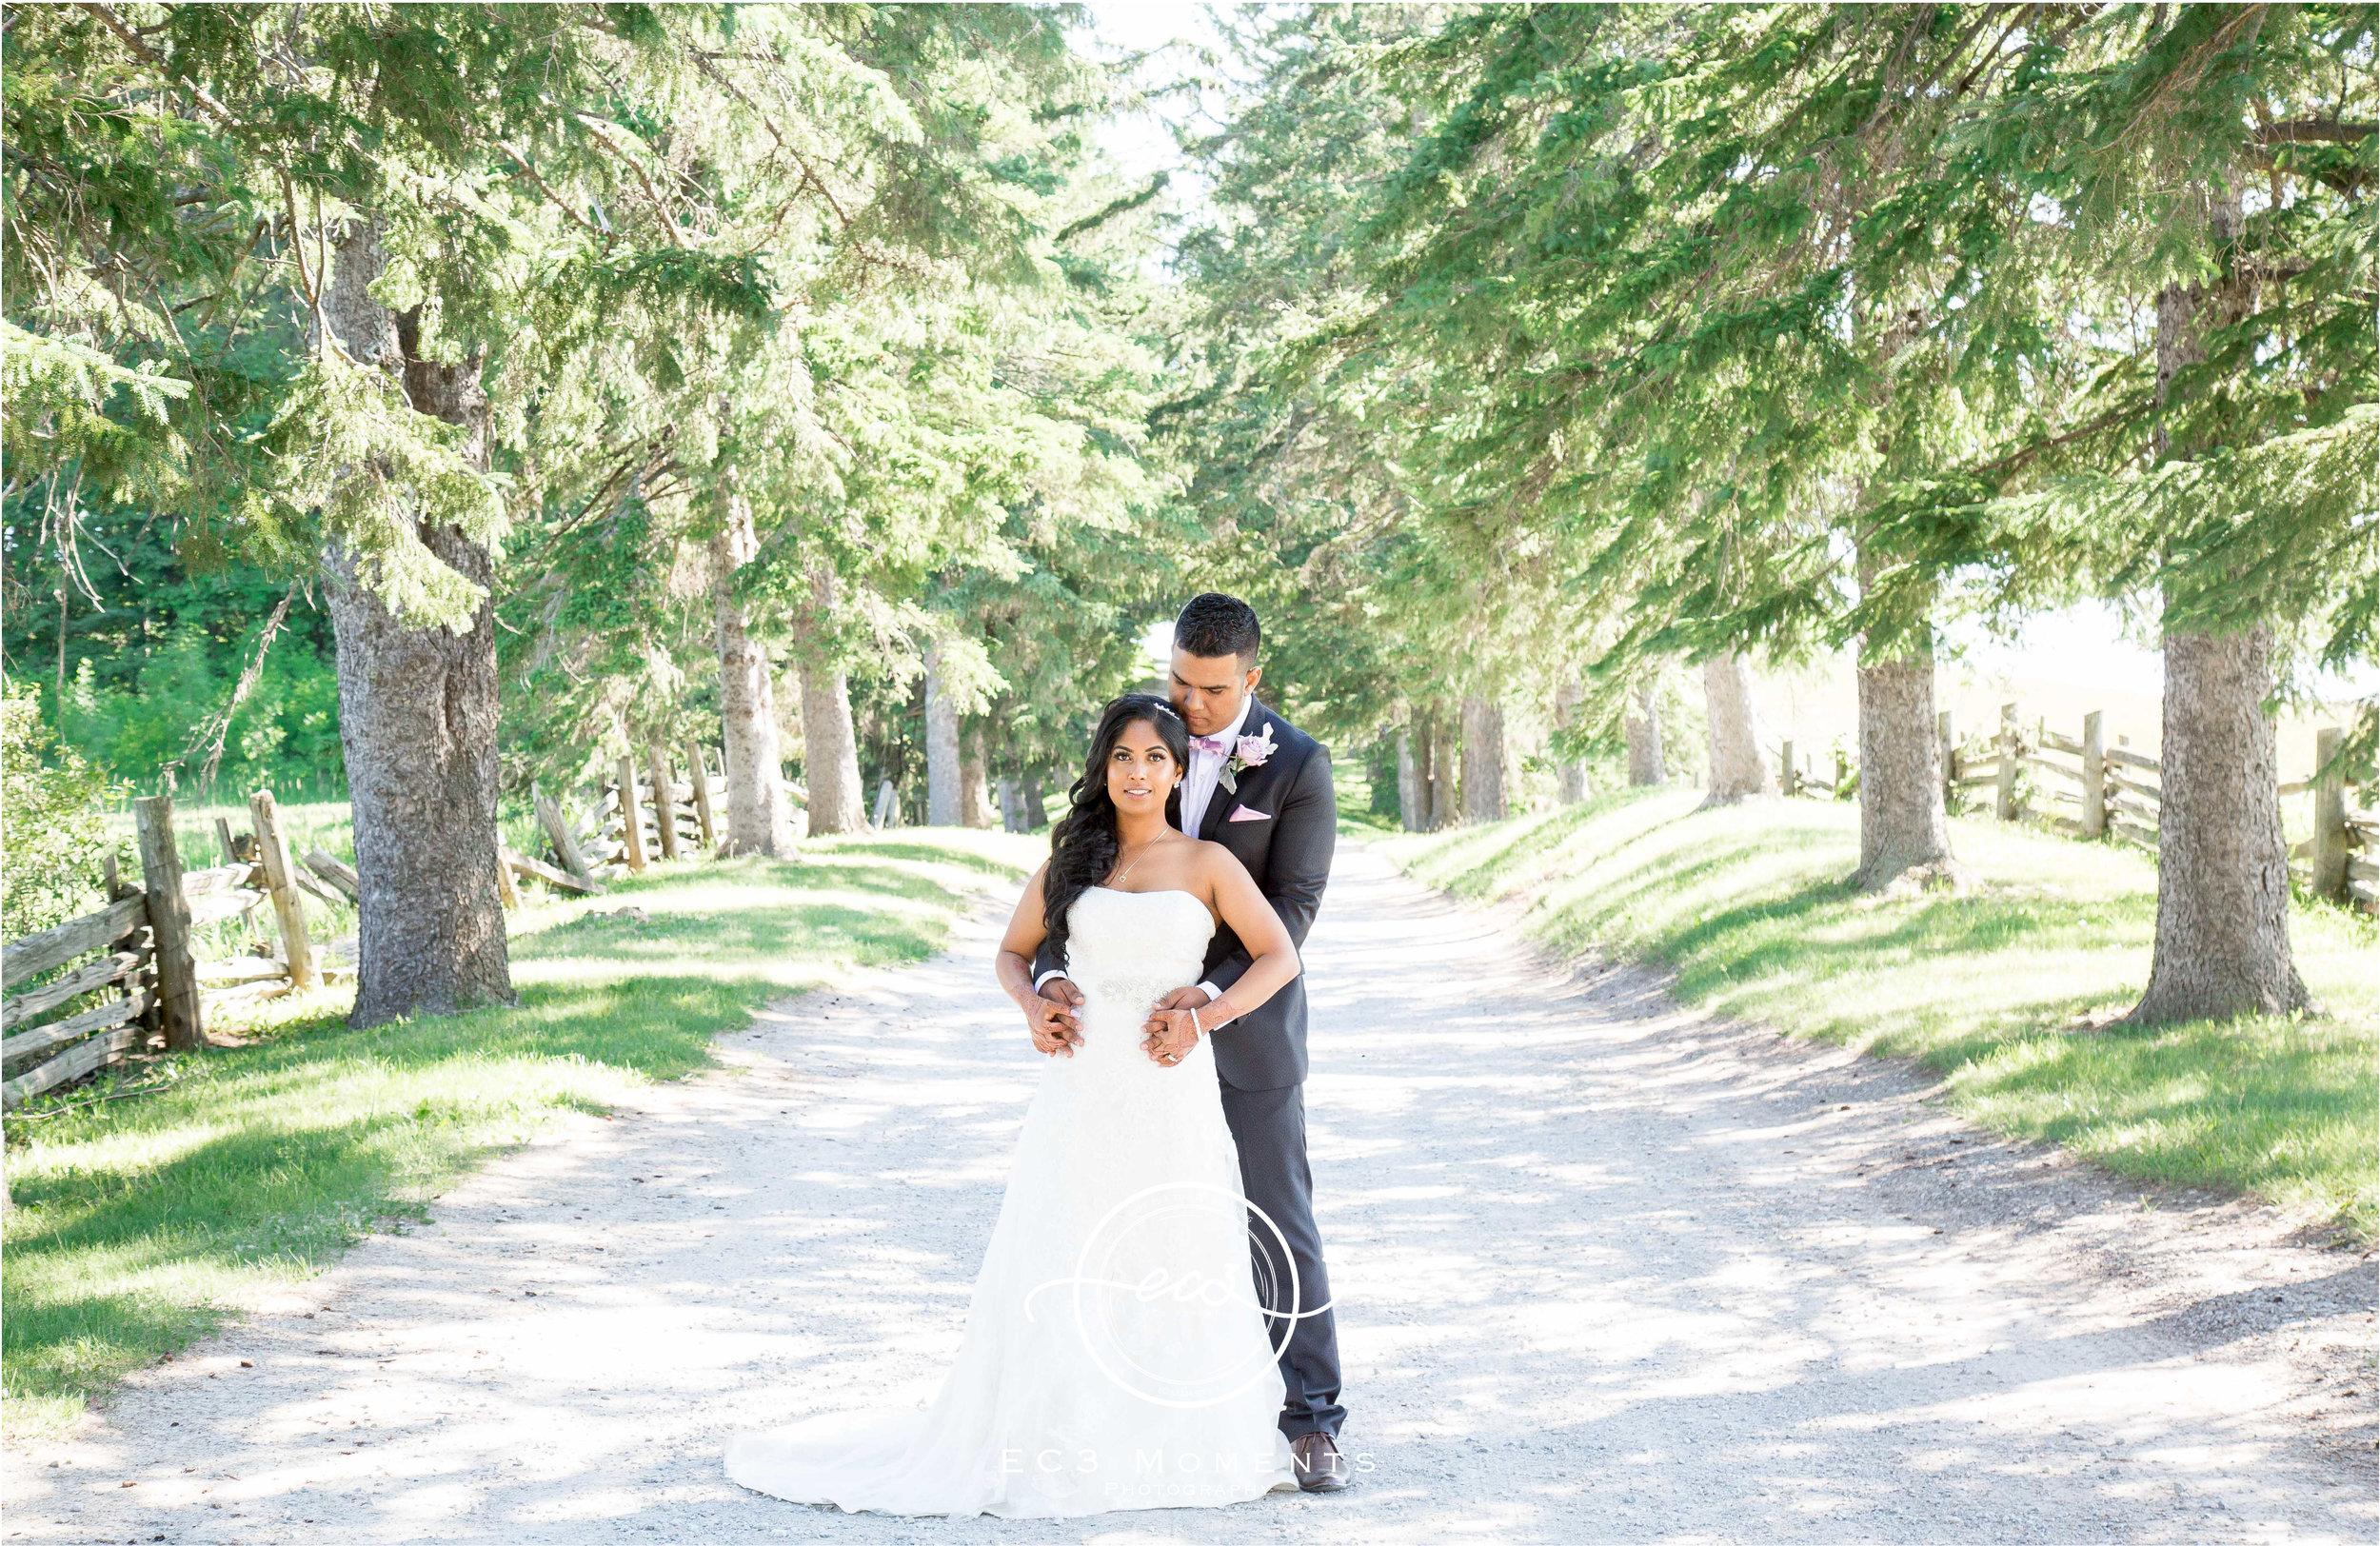 Indian Wedding Ec3 Moments